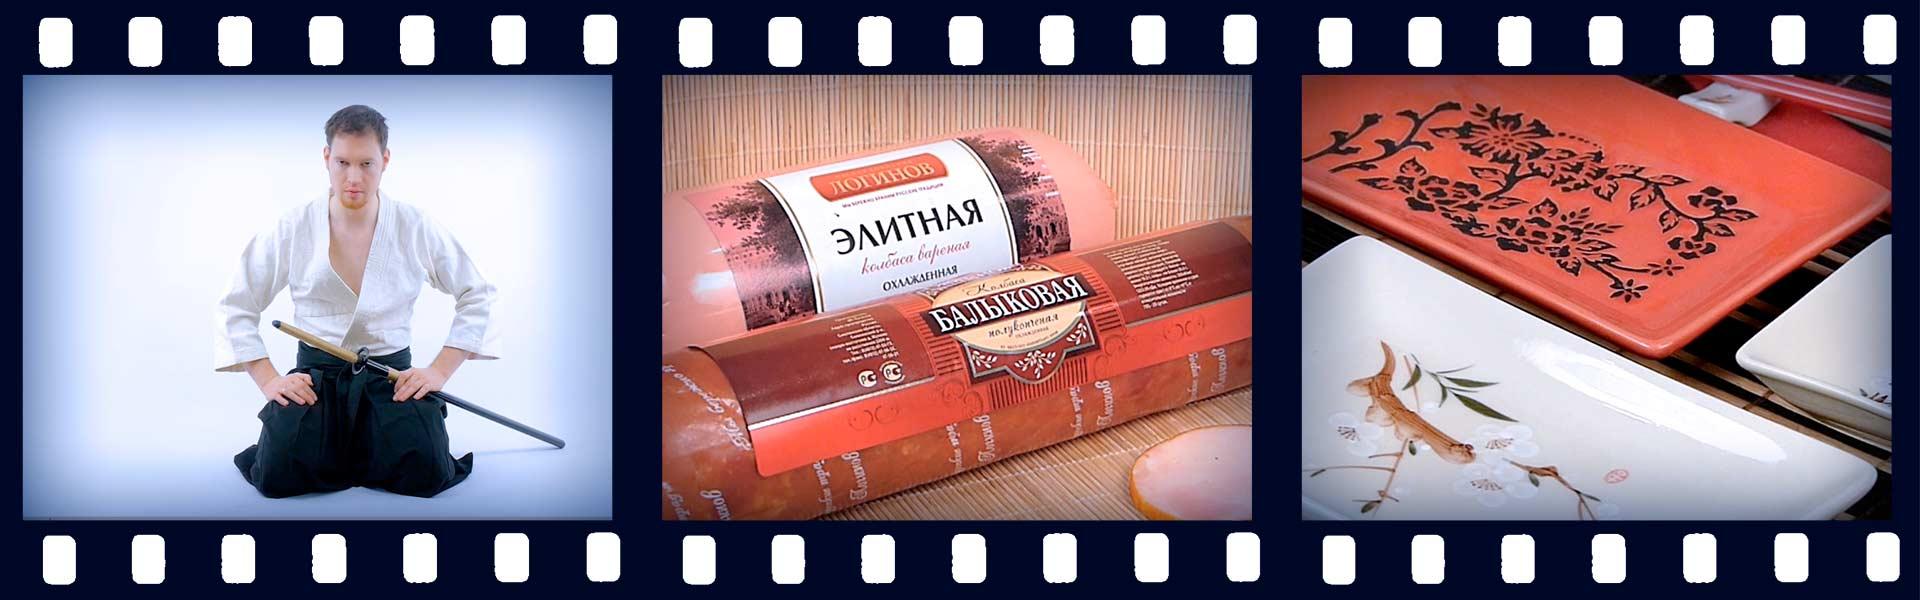 "телереклама колбас ""Логинов"""